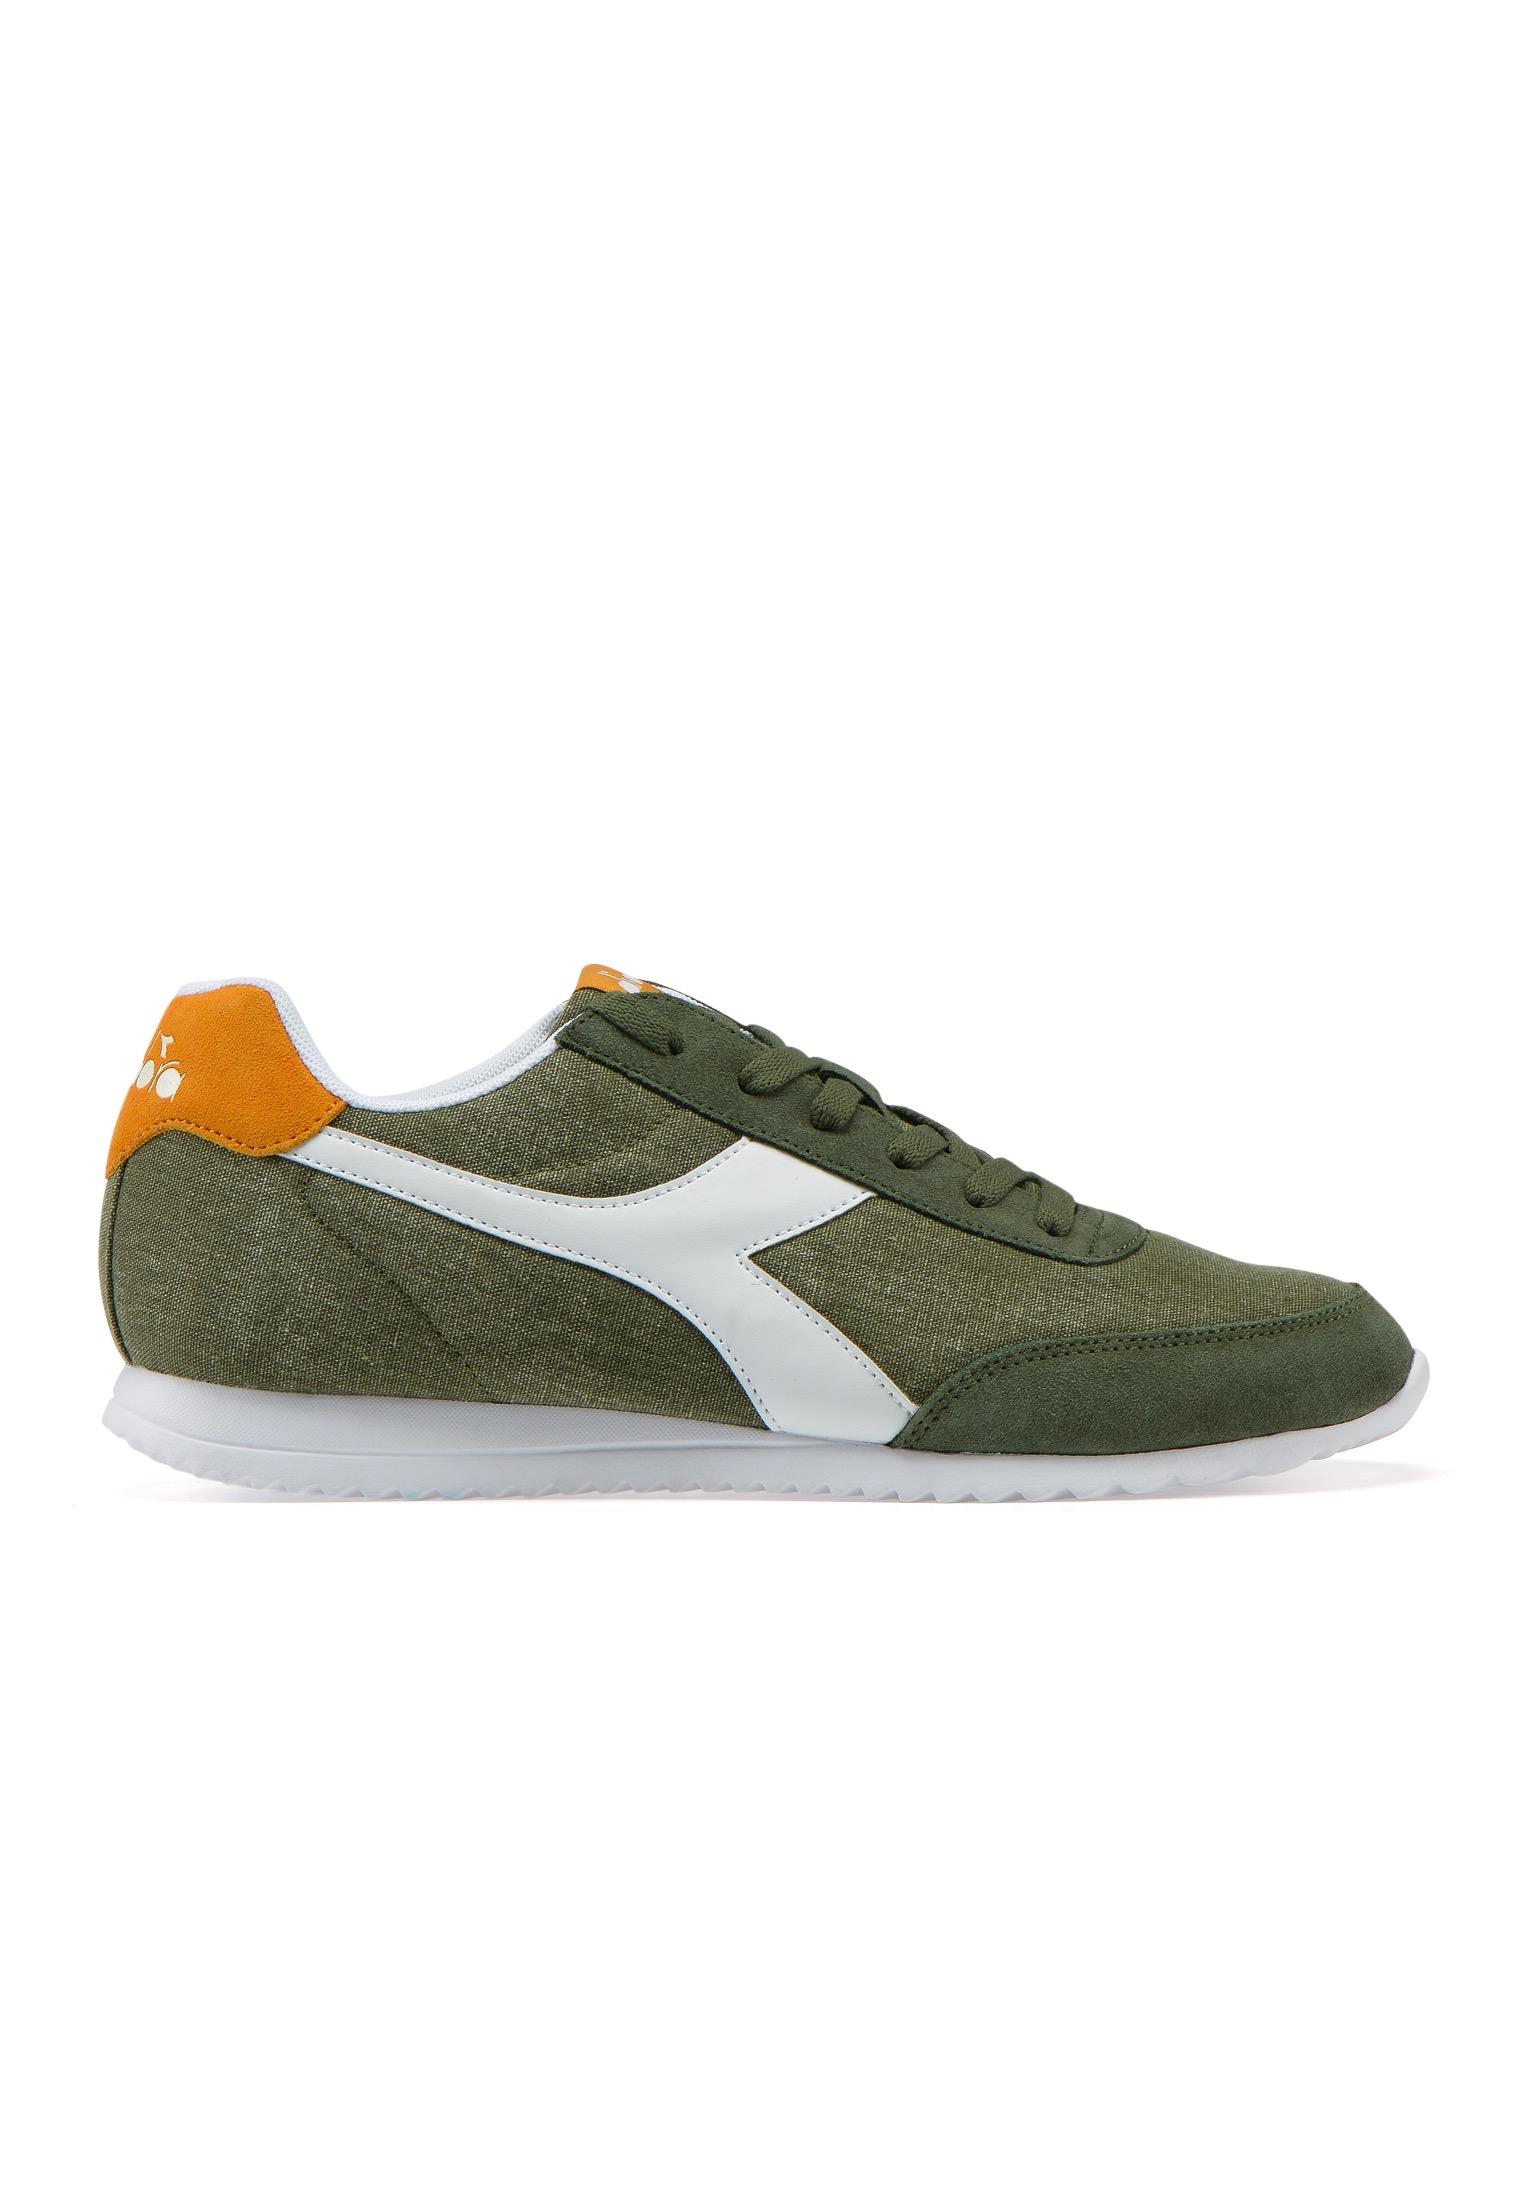 Scarpe-Diadora-Jog-Light-C-Sneakers-sportive-uomo-donna-vari-colori-e-taglie miniatura 39